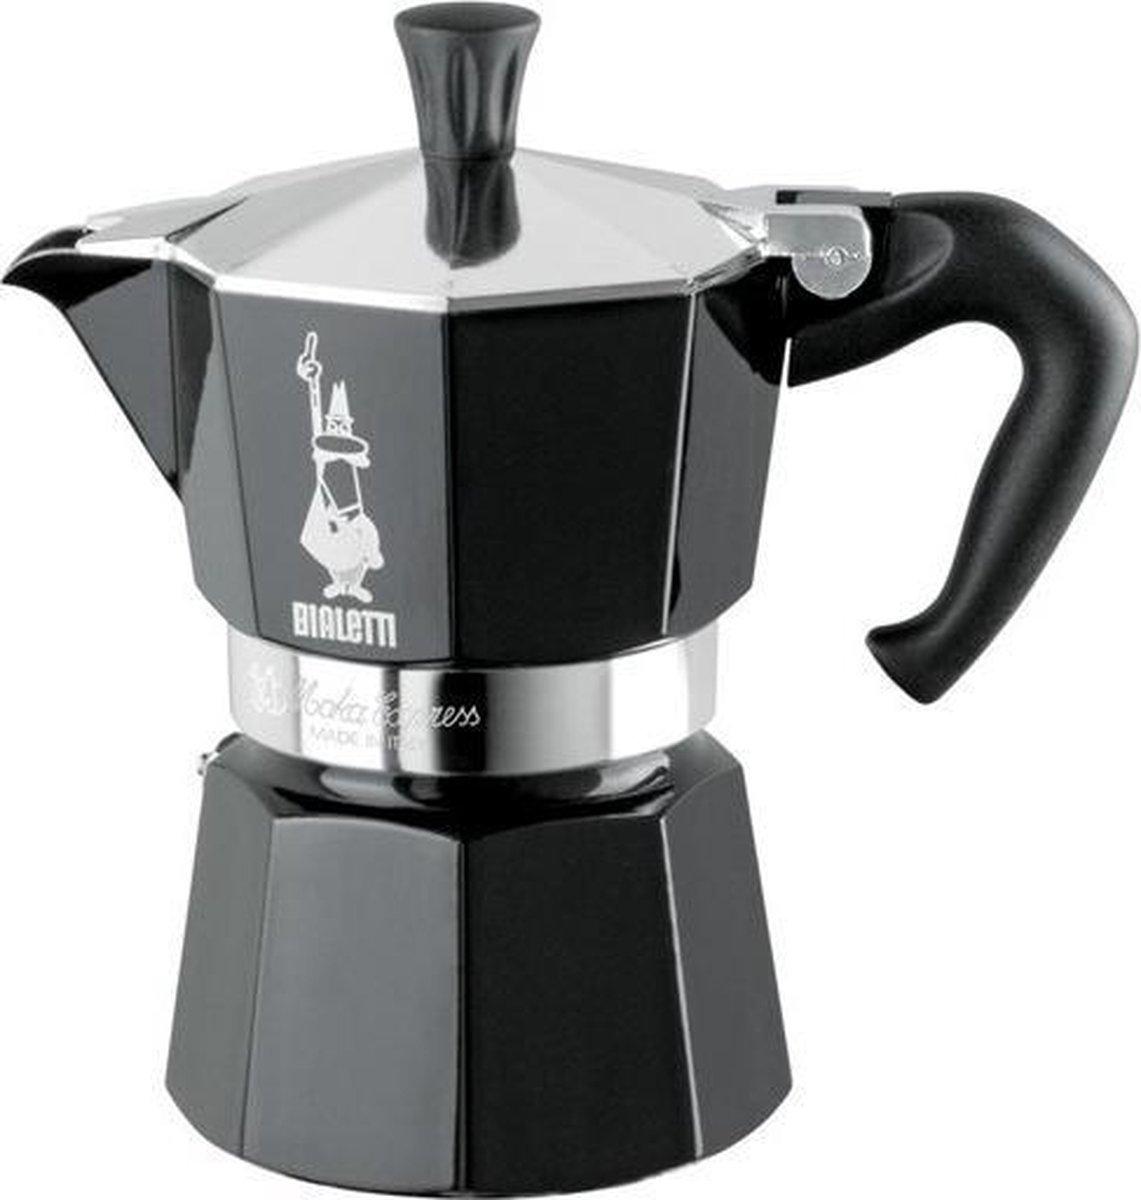 Bialetti - Moka Express - 3 Cups - Black (4952)